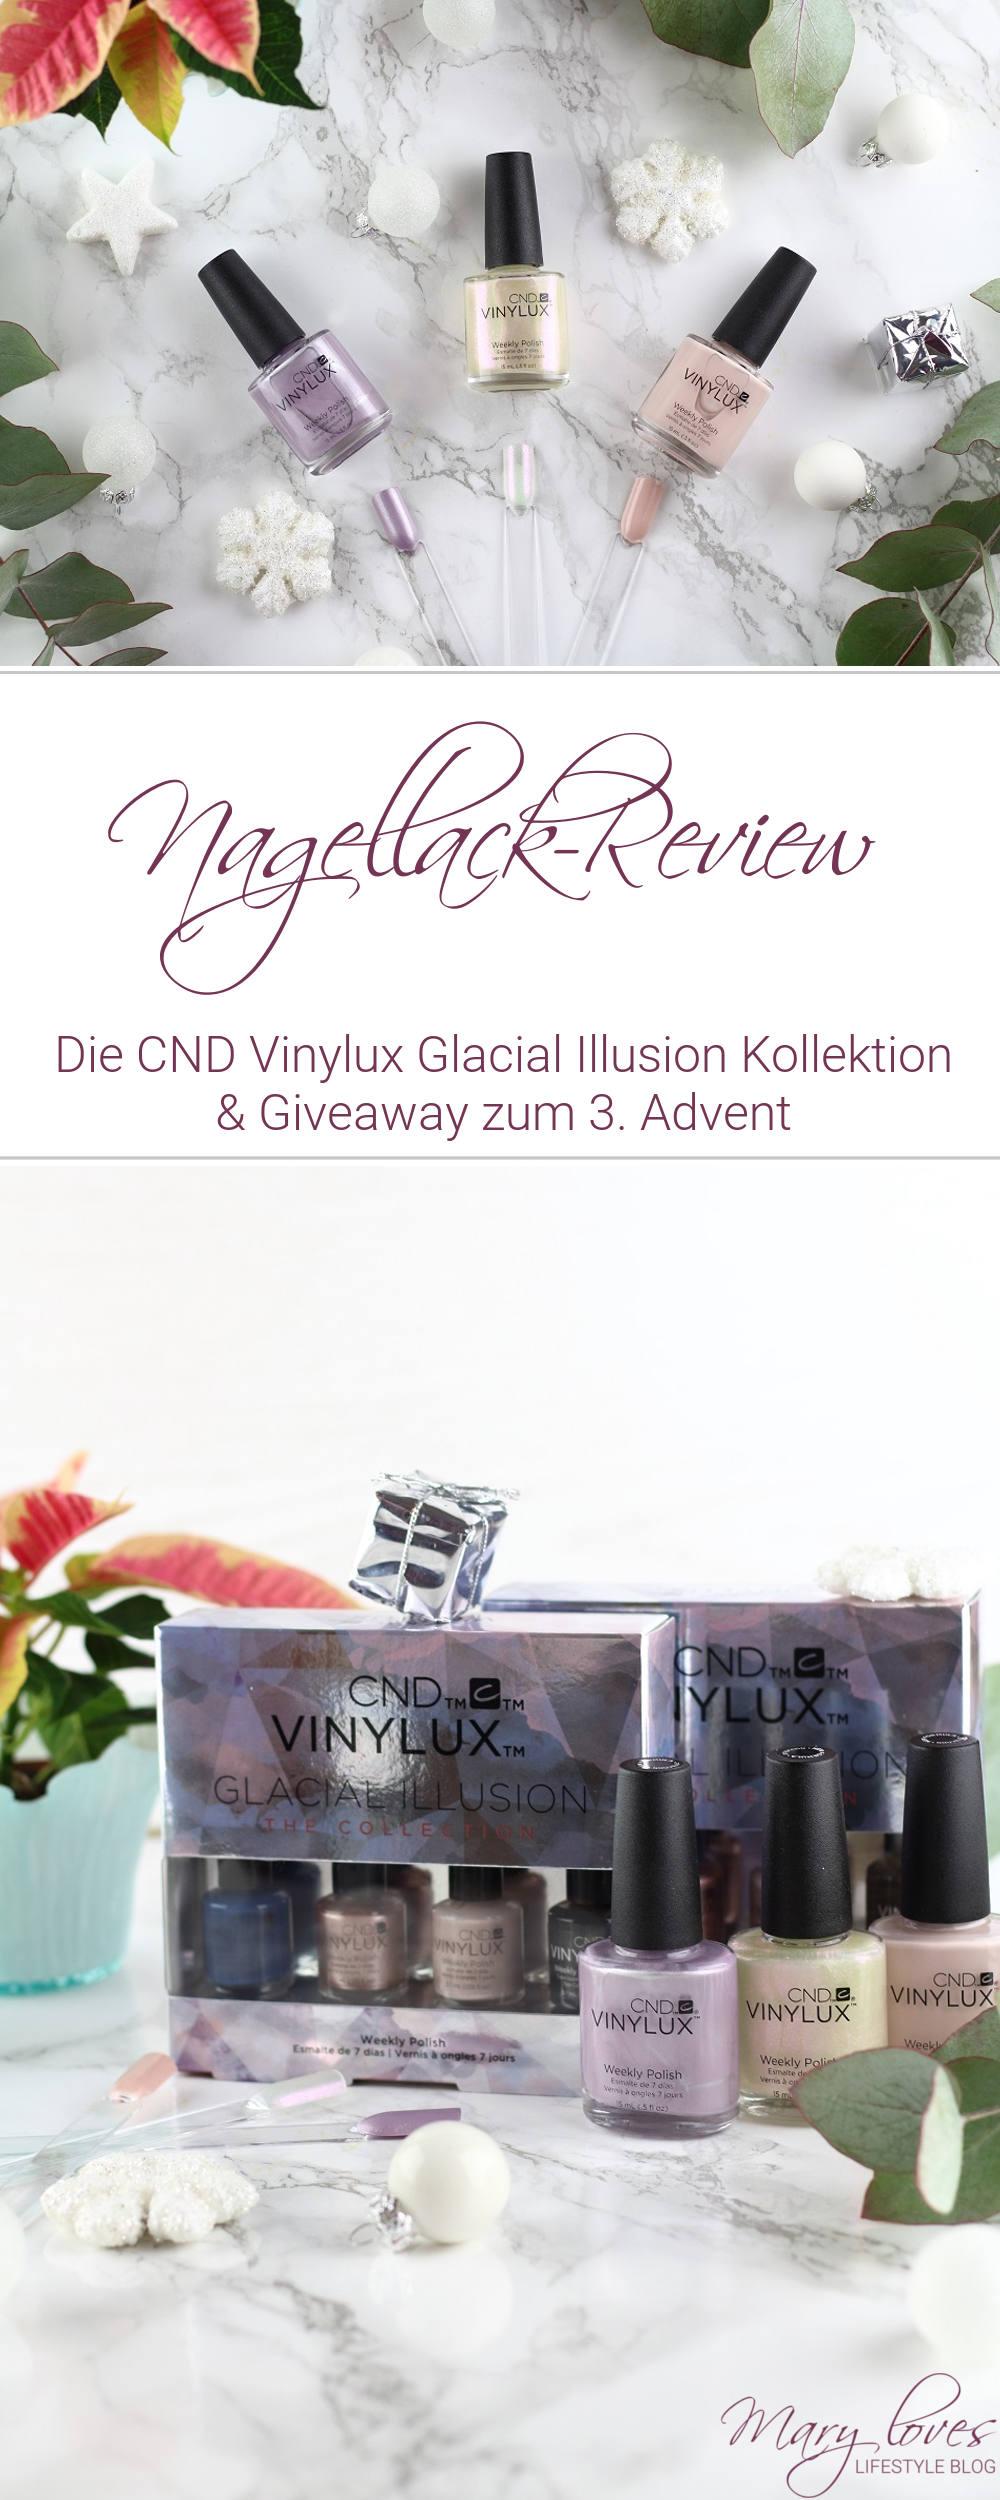 Die CND Vinylux Glacial Illusion Kollektion & Giveaway zum 3. Advent - #nagellack #nailpolish #cndvinylux #cndvinyluxglacialillusion #glacialillusion #gewinnspiel